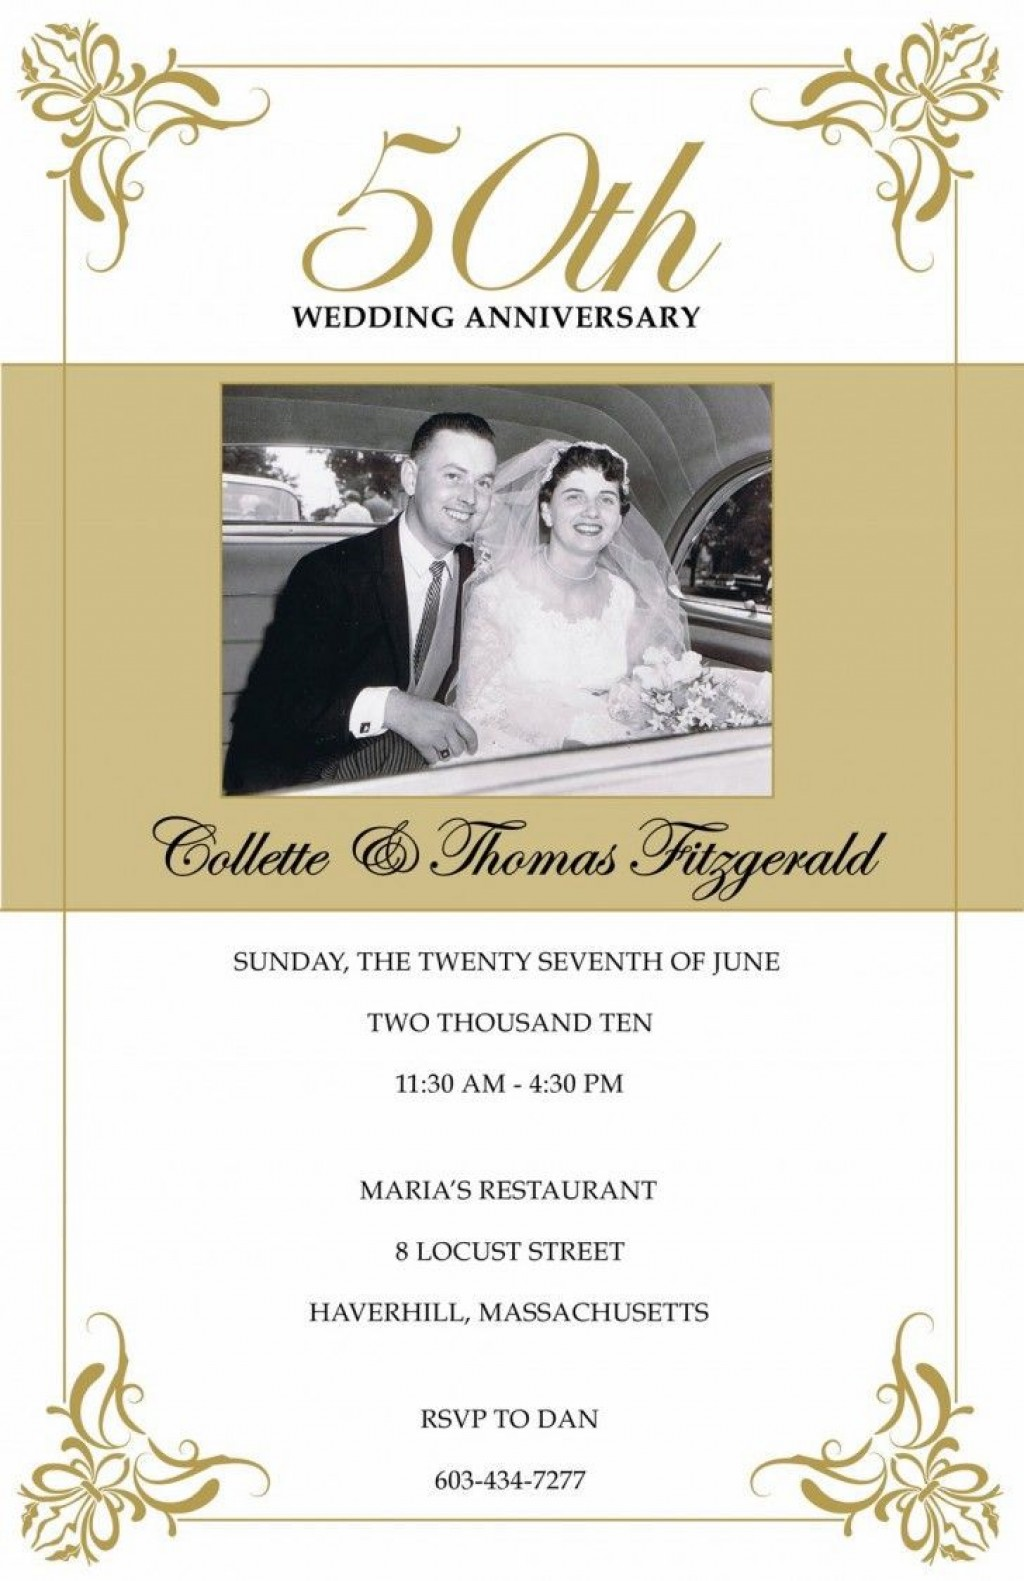 008 Shocking 50th Anniversary Invitation Design Idea  Designs Wedding Template Microsoft Word Surprise Party Wording CardLarge